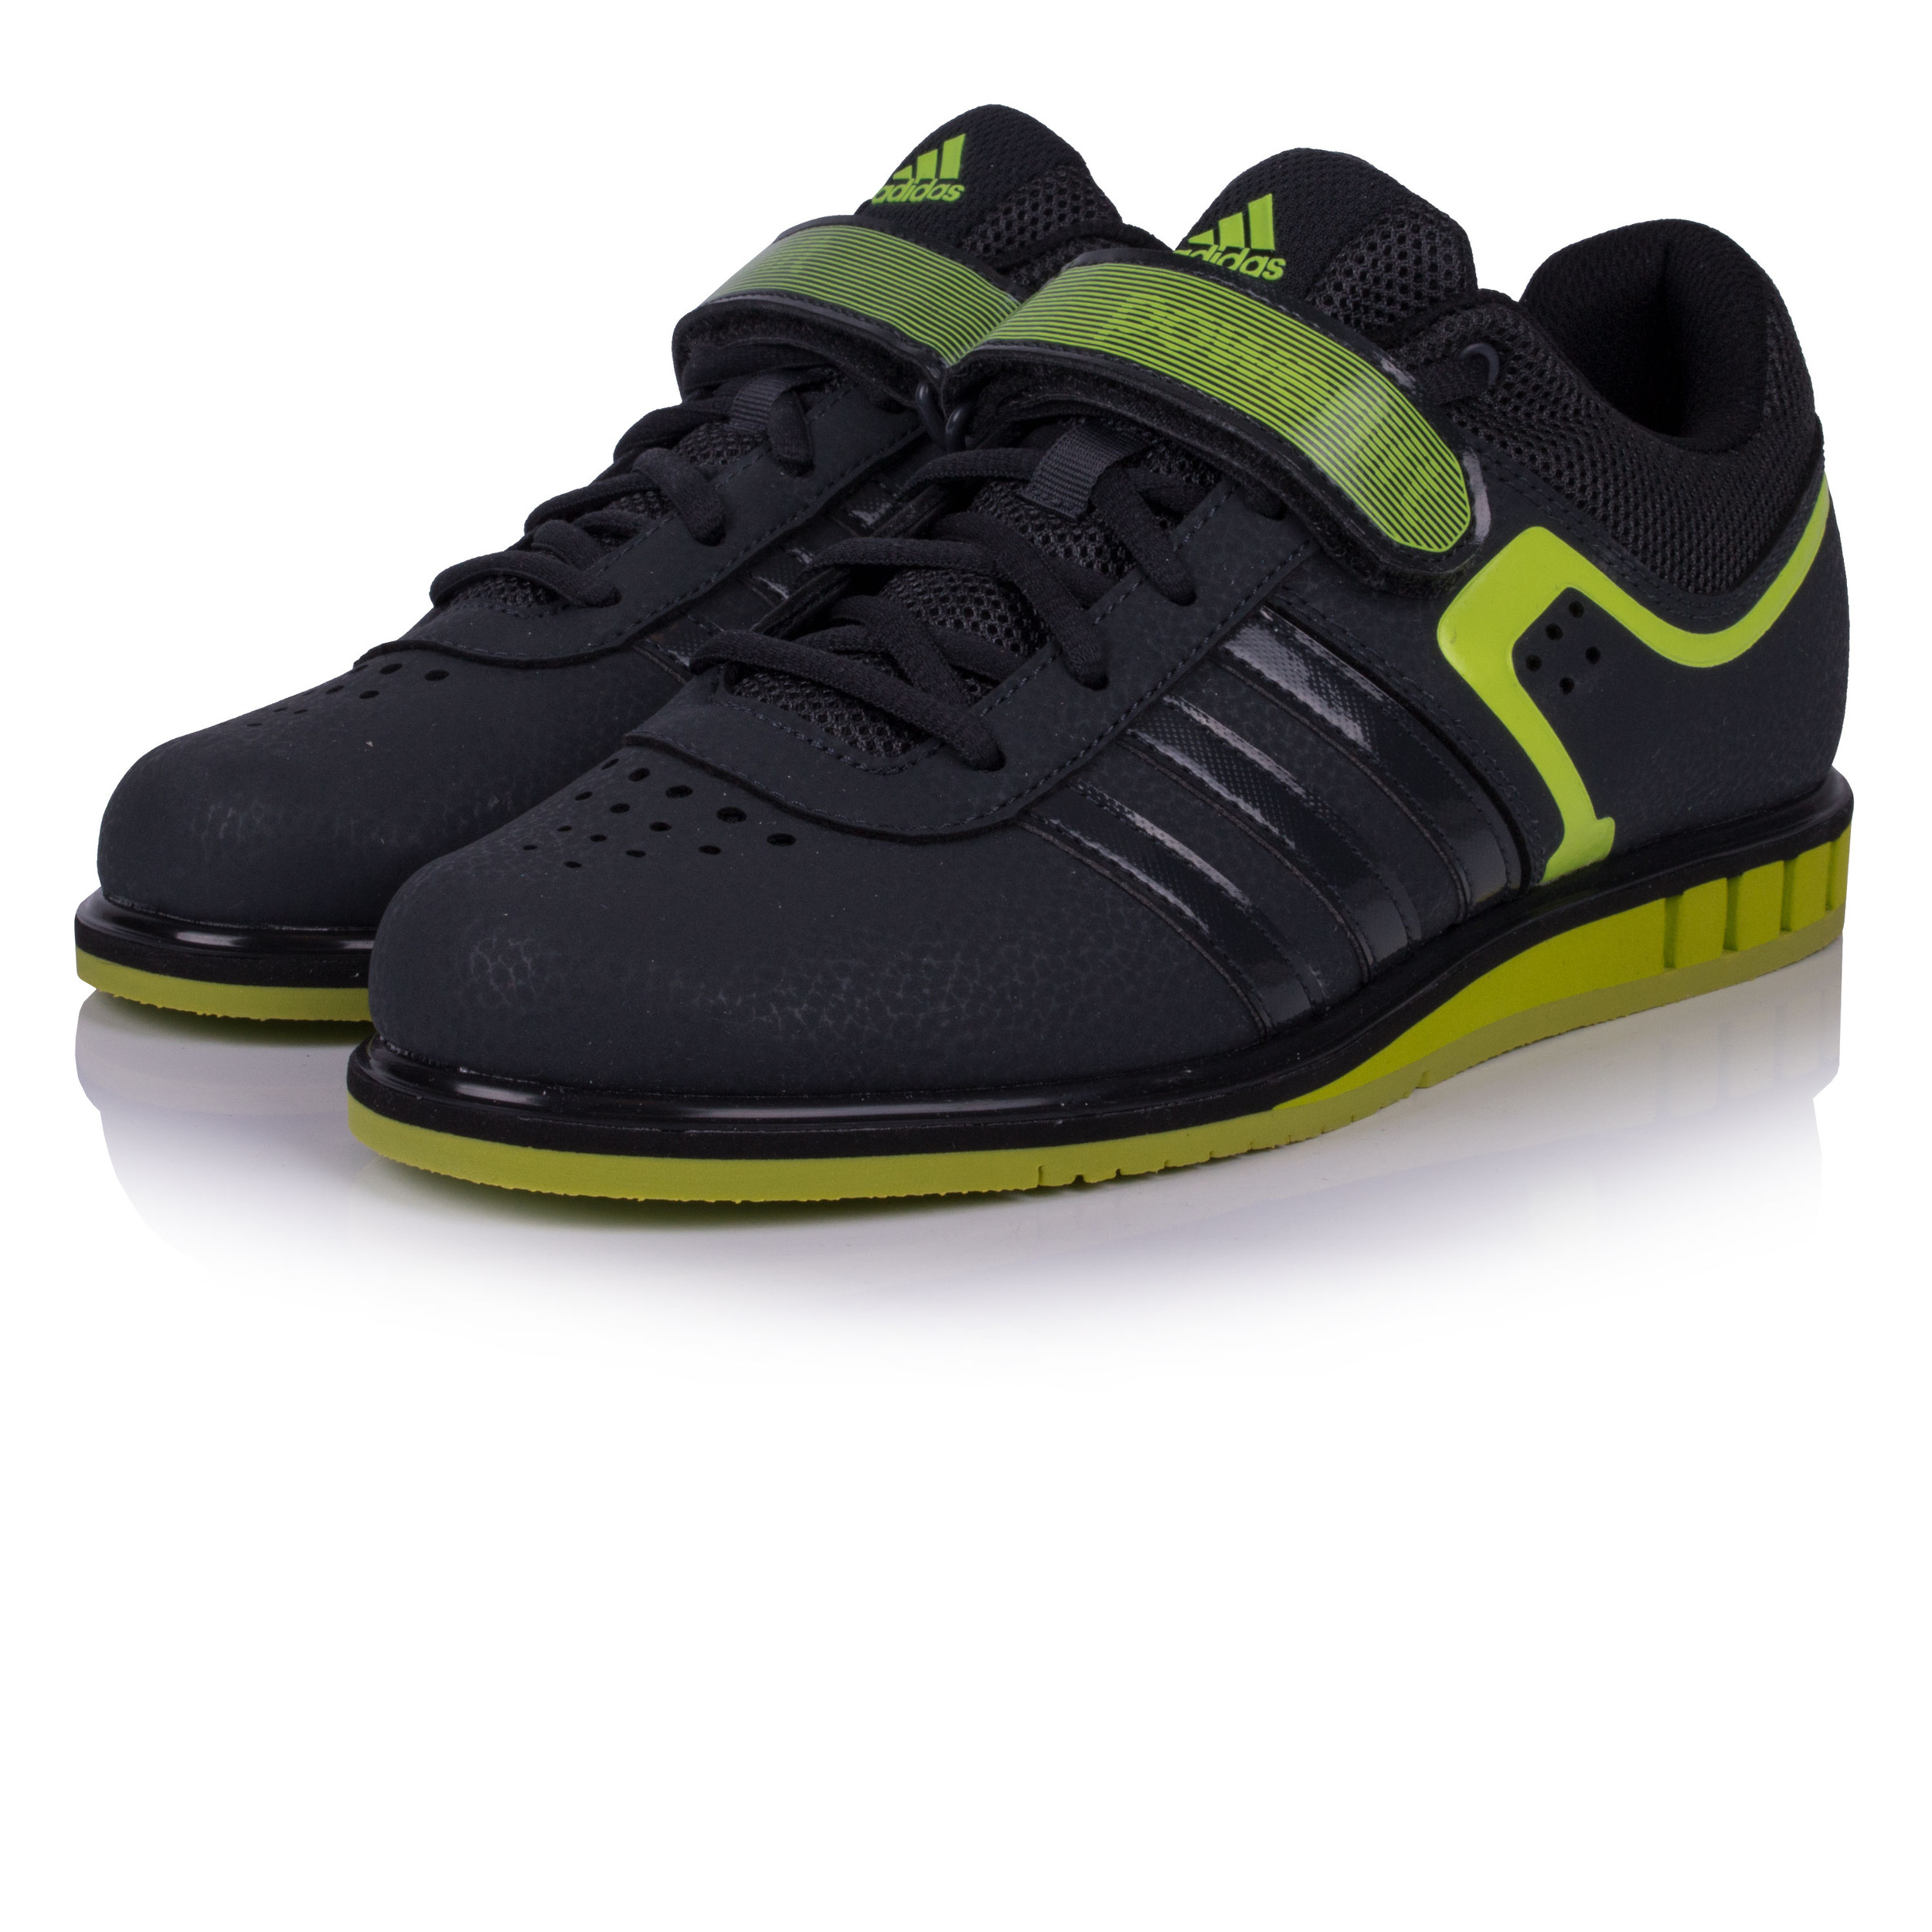 super popular 3fbc2 27fc7 Adidas Hommes Powerlift 2.0 Chaussures De Haltérophilie Noir Vert Sport Gym